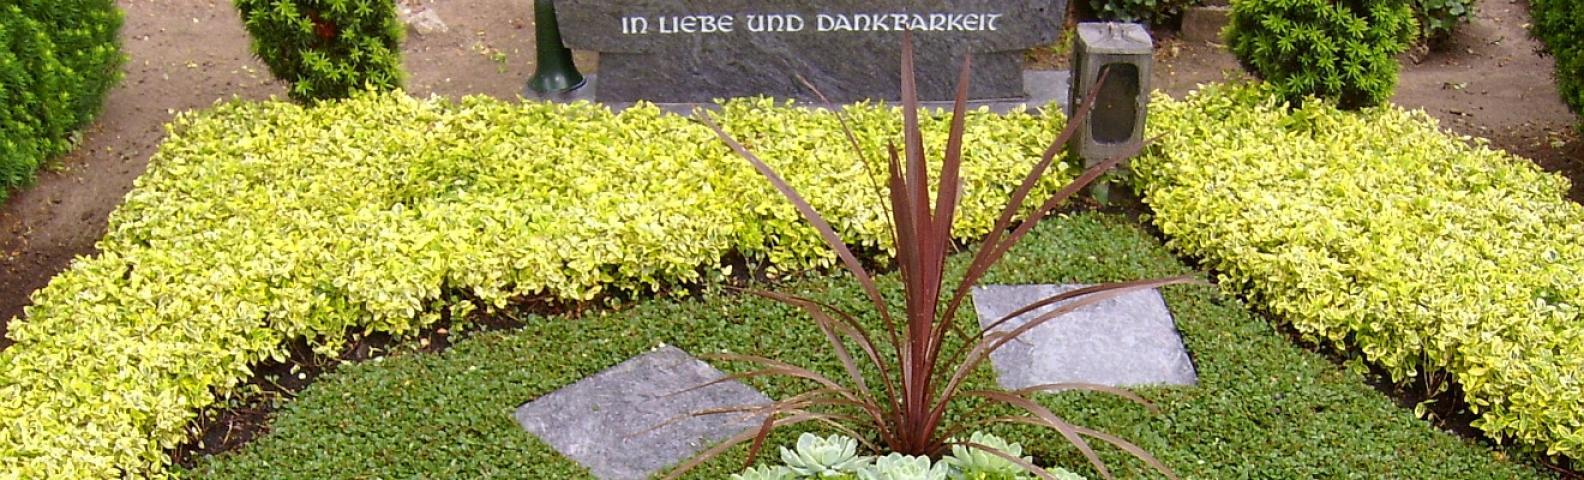 garten rasen in magdeburg infobel deutschland. Black Bedroom Furniture Sets. Home Design Ideas